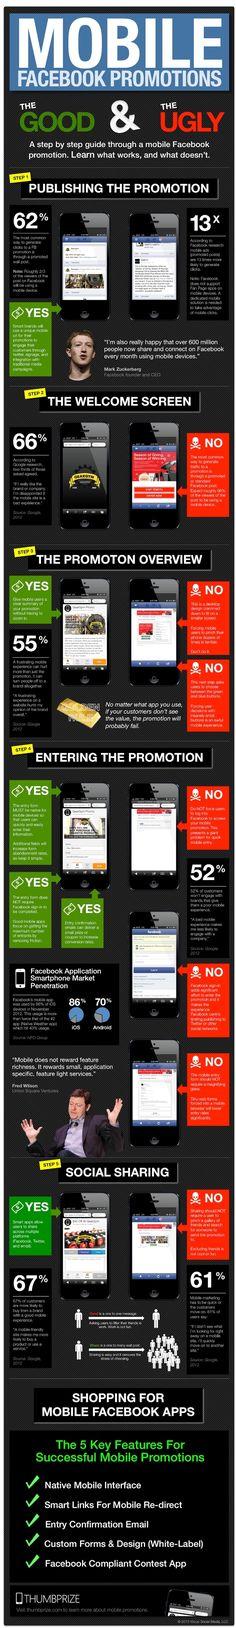 Mobile Facebook Promotion